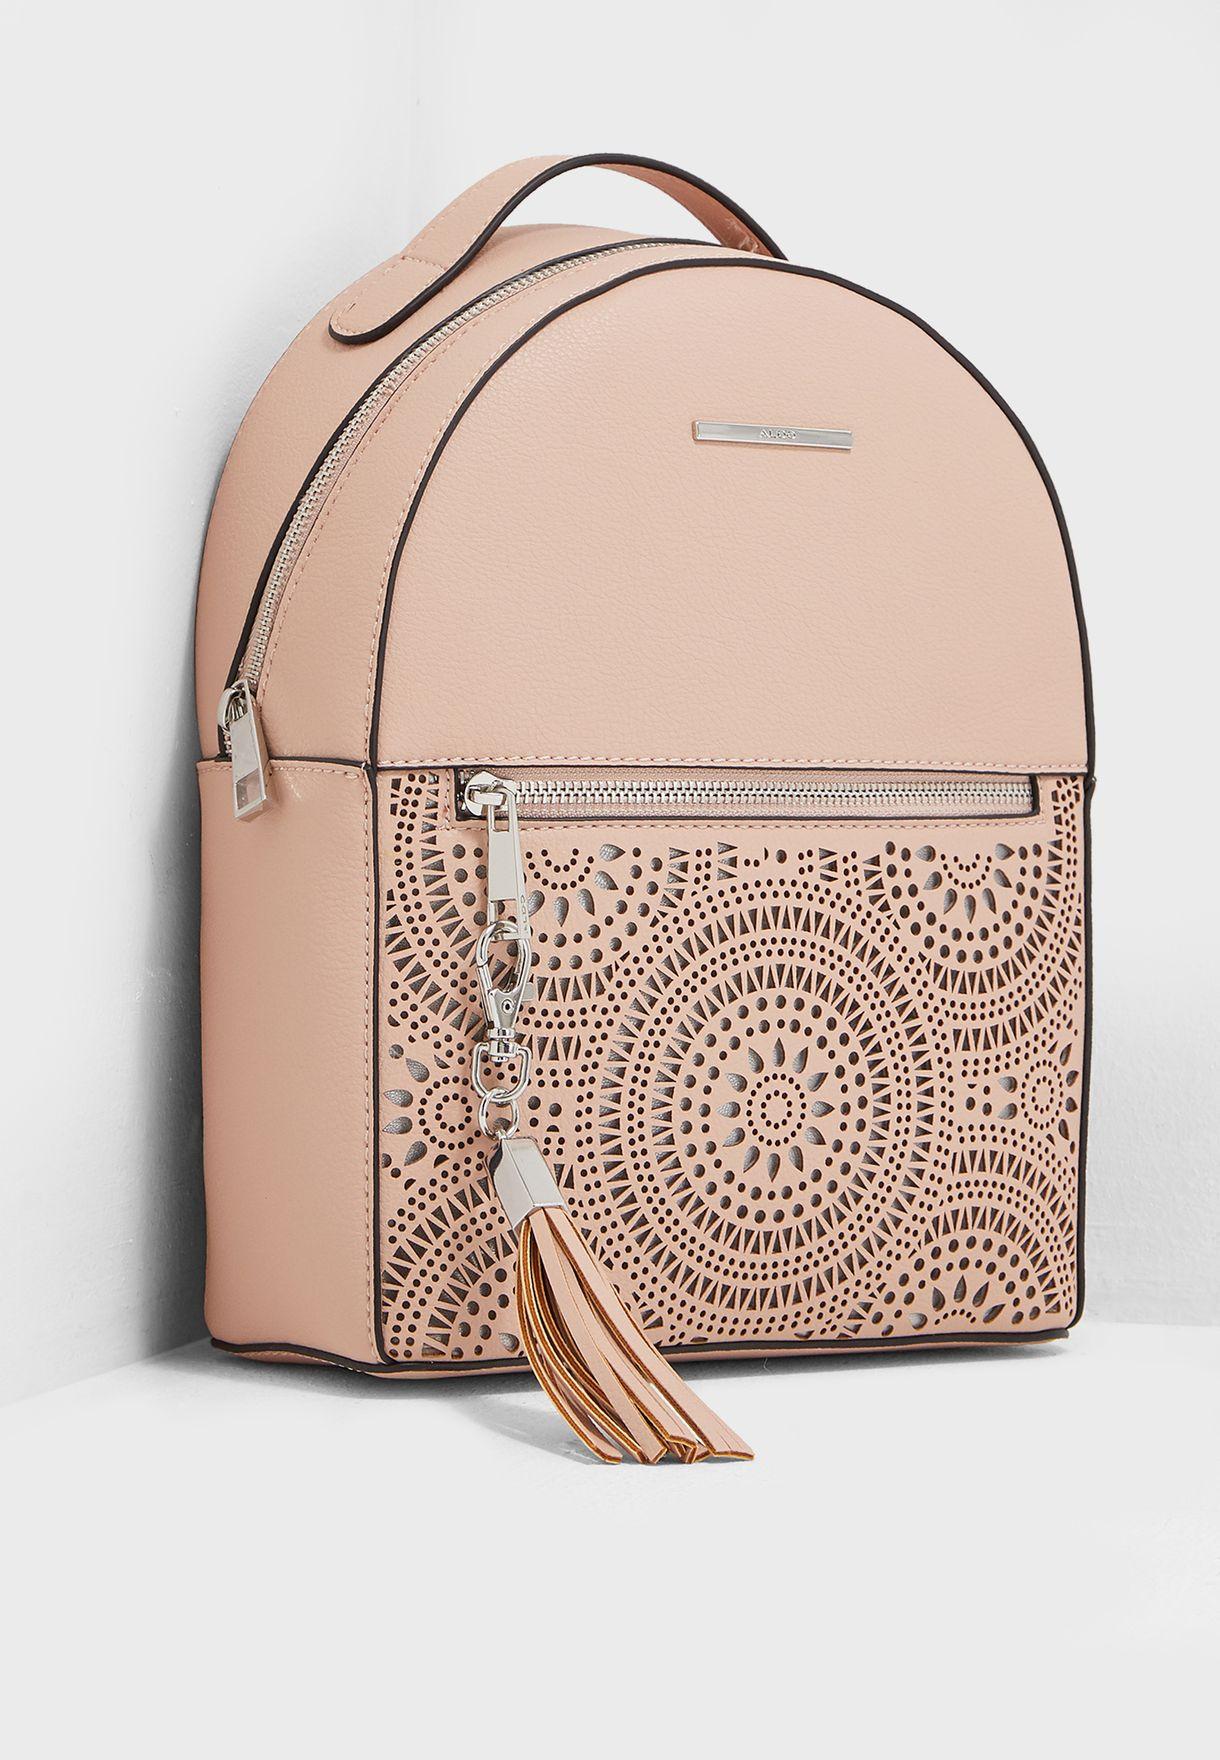 b71797d5c77 Shop Aldo pink Barmegona Backpack BARMEGONA55 for Women in Qatar ...